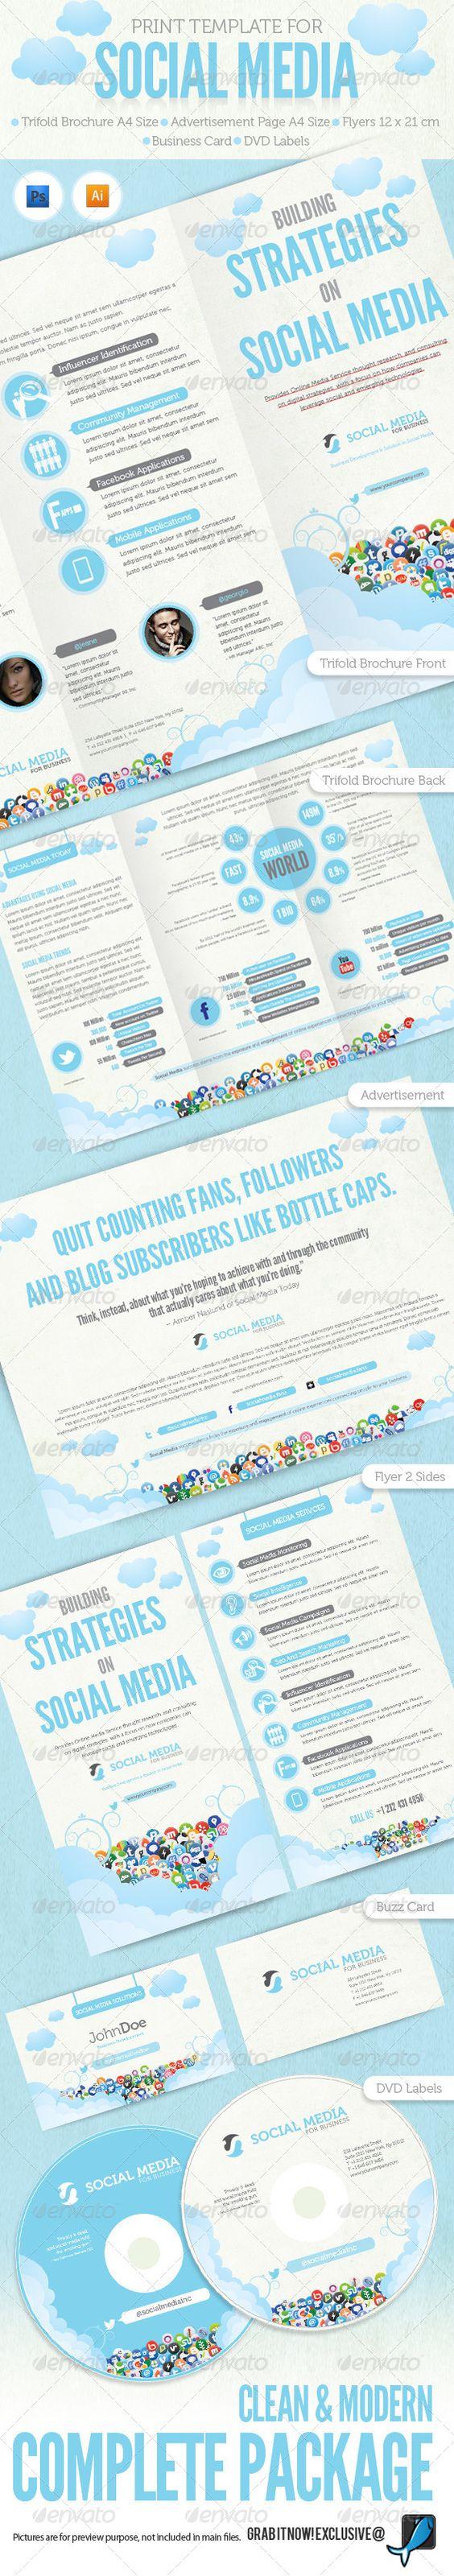 social media brochure template - fonts adobe and facebook on pinterest